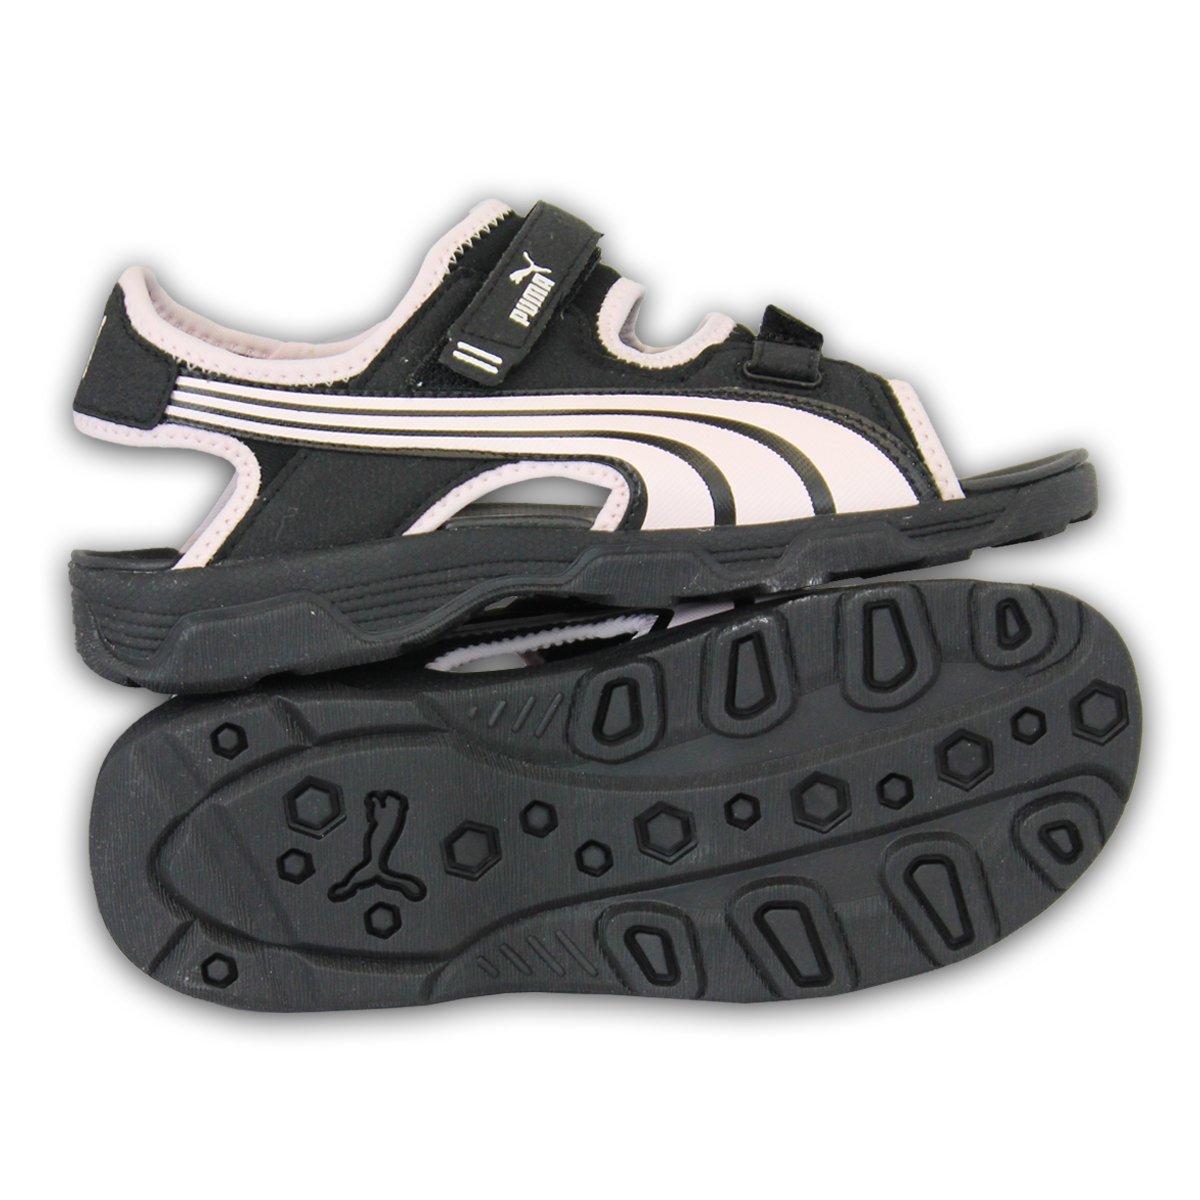 PUMA Girls Stylish Sandals